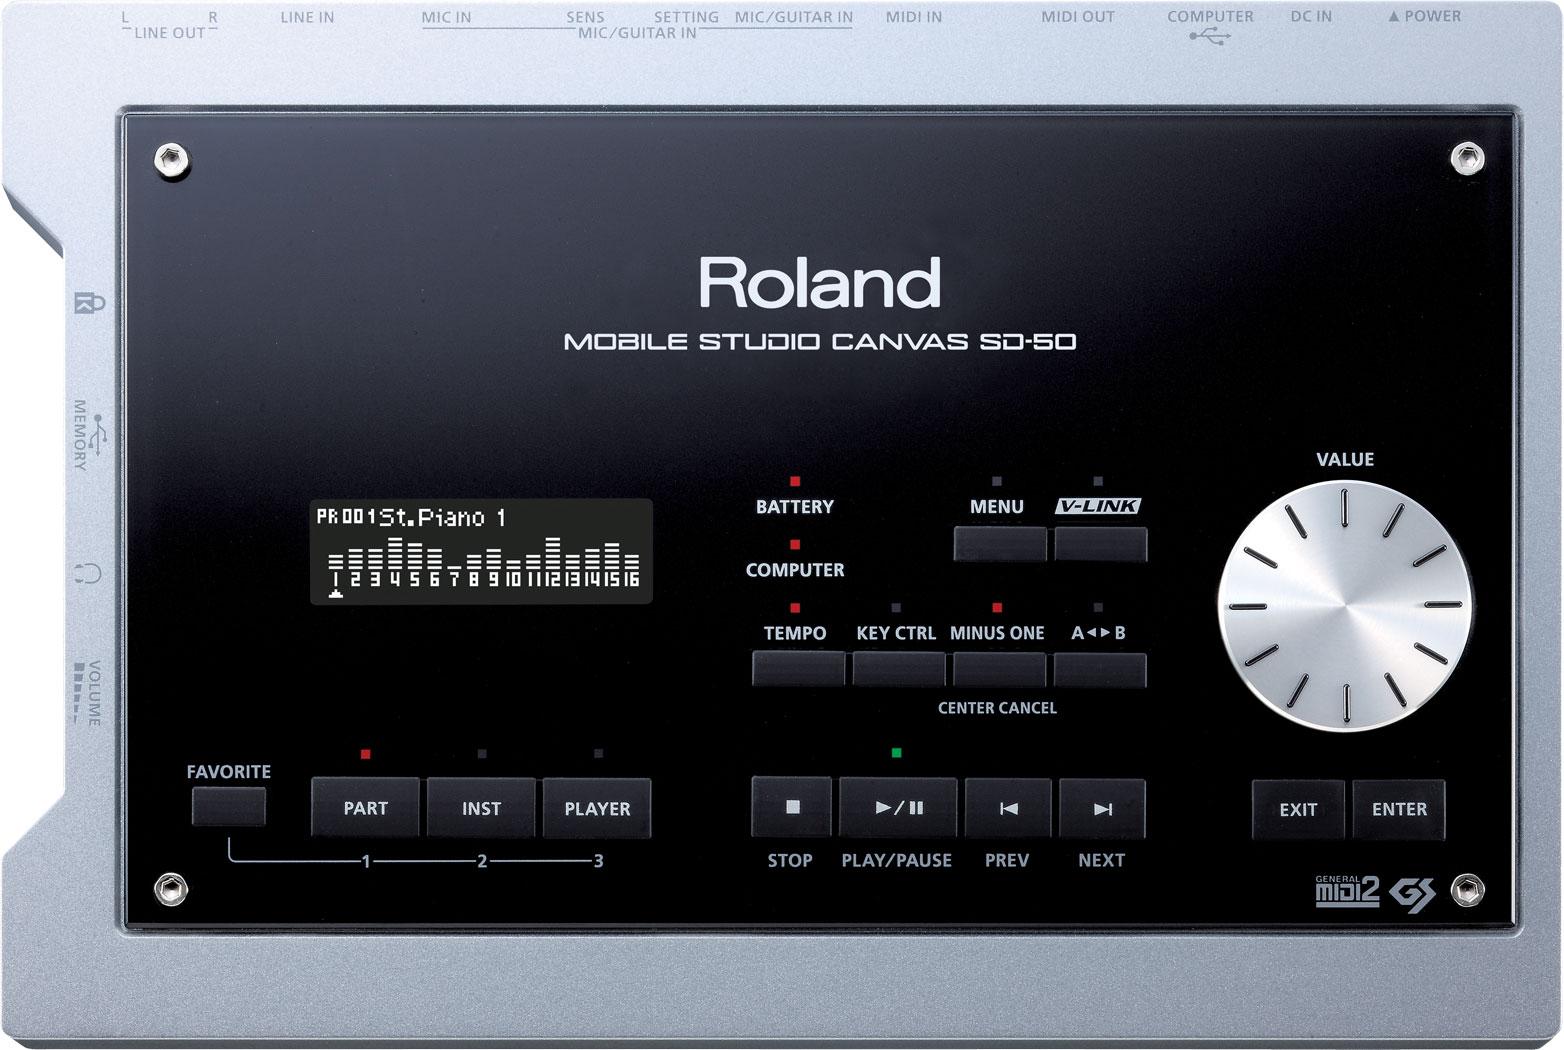 Roland - Mobile Studio Canvas | Sound Module with DAW Software